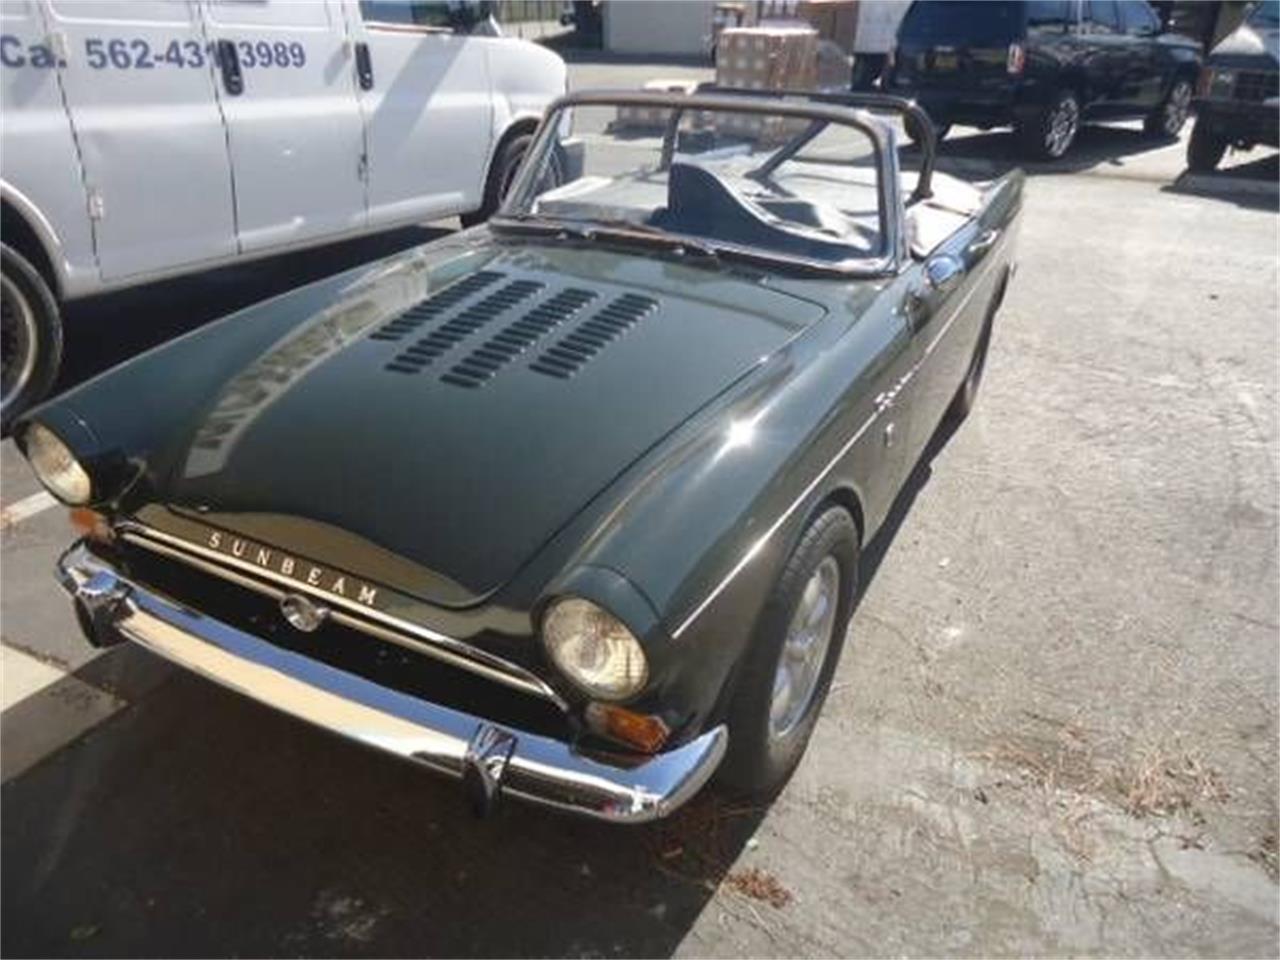 1965 Sunbeam Tiger For Sale Classiccars Com Cc 1185439